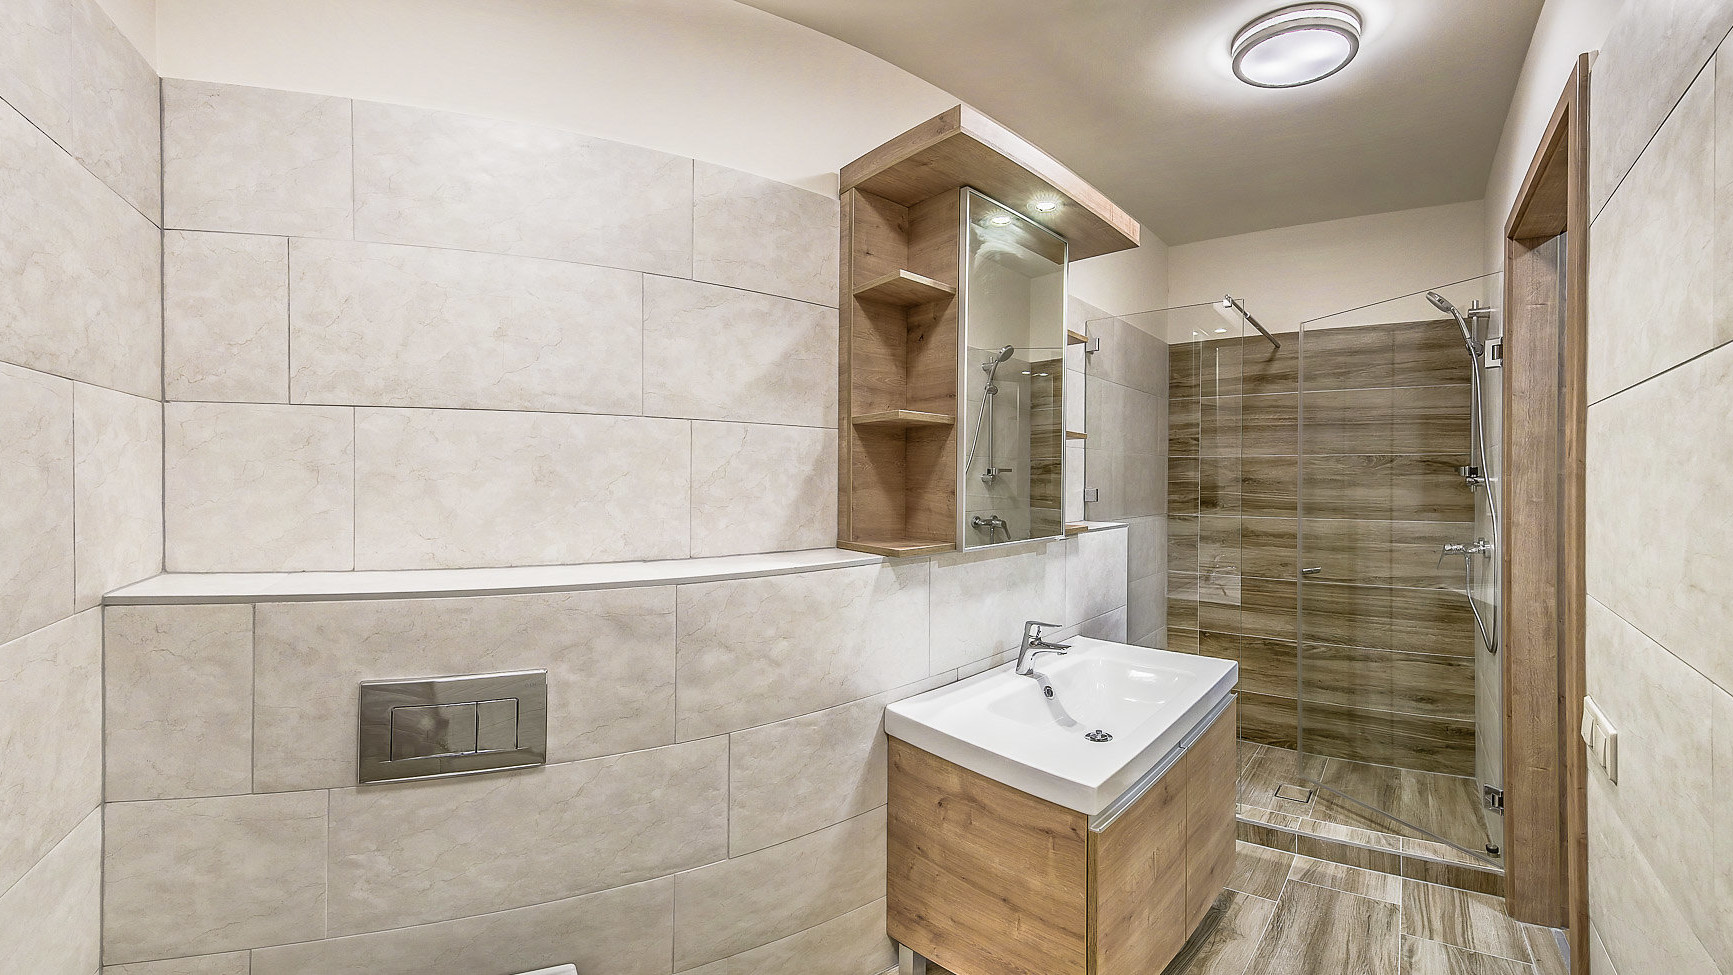 20180212 crystalproperty2 szekely 002 2K NW uai - Art Homes Budapest